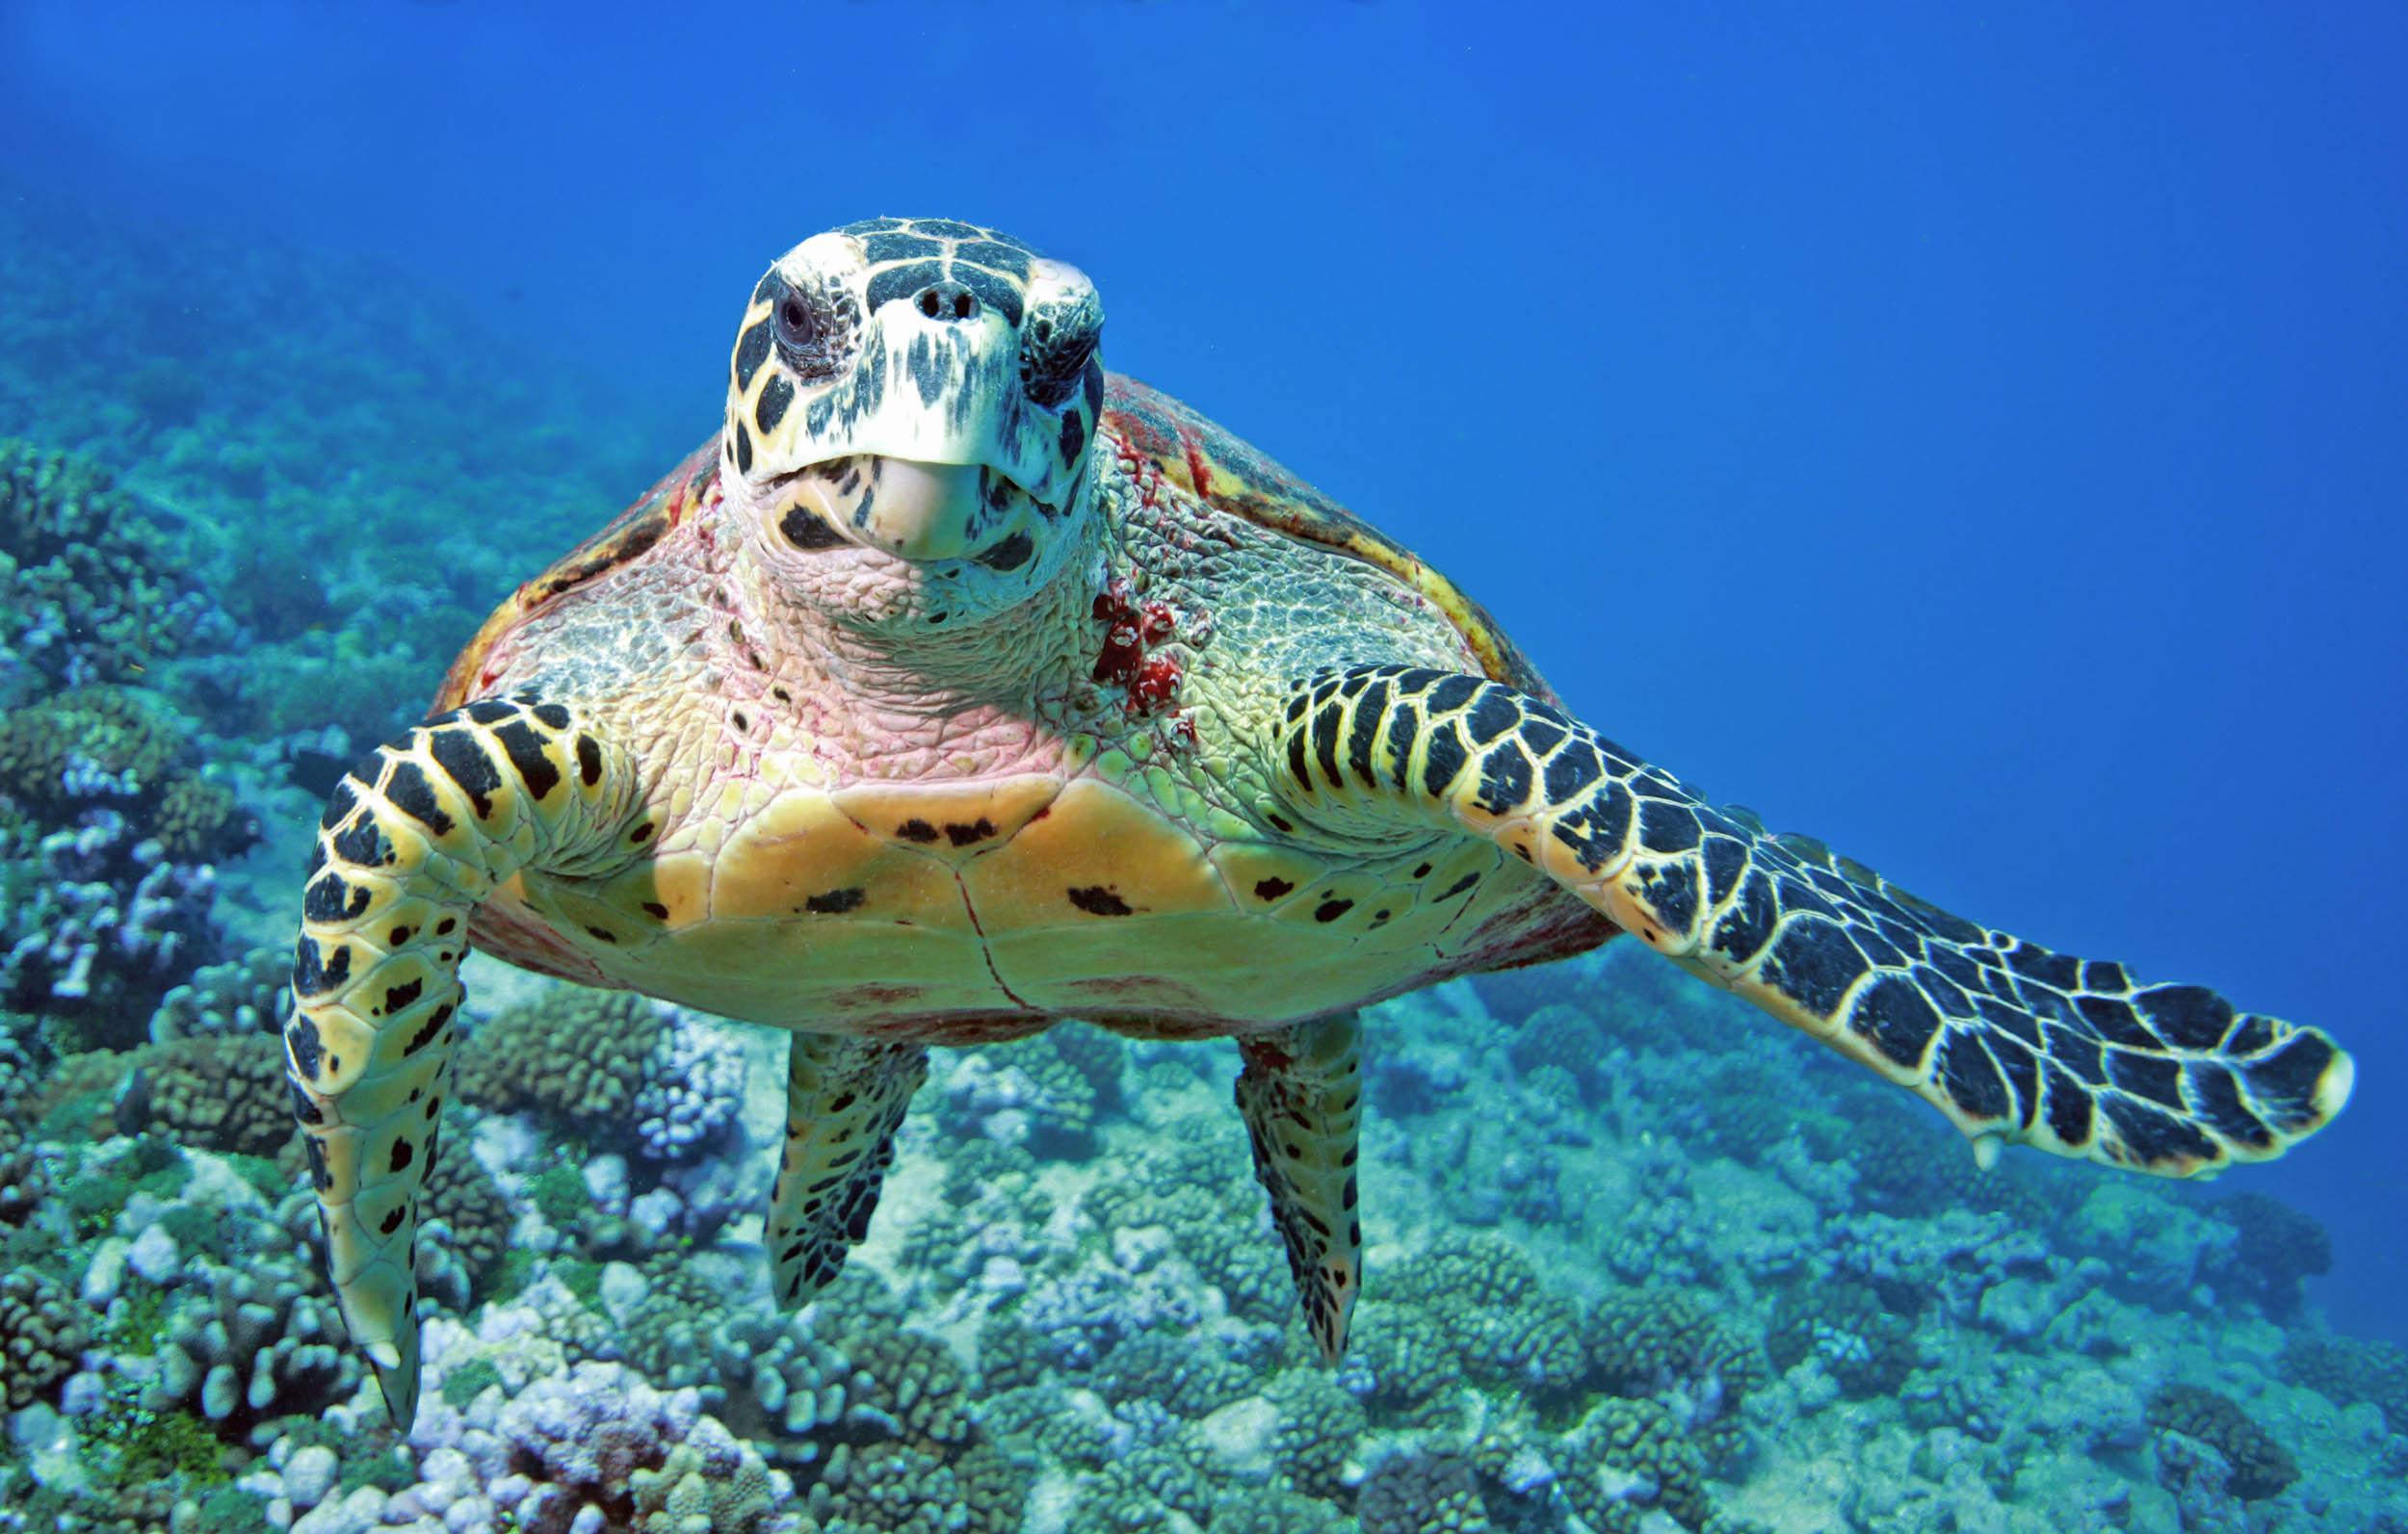 sea turtles originated in the united states u2022 earth com